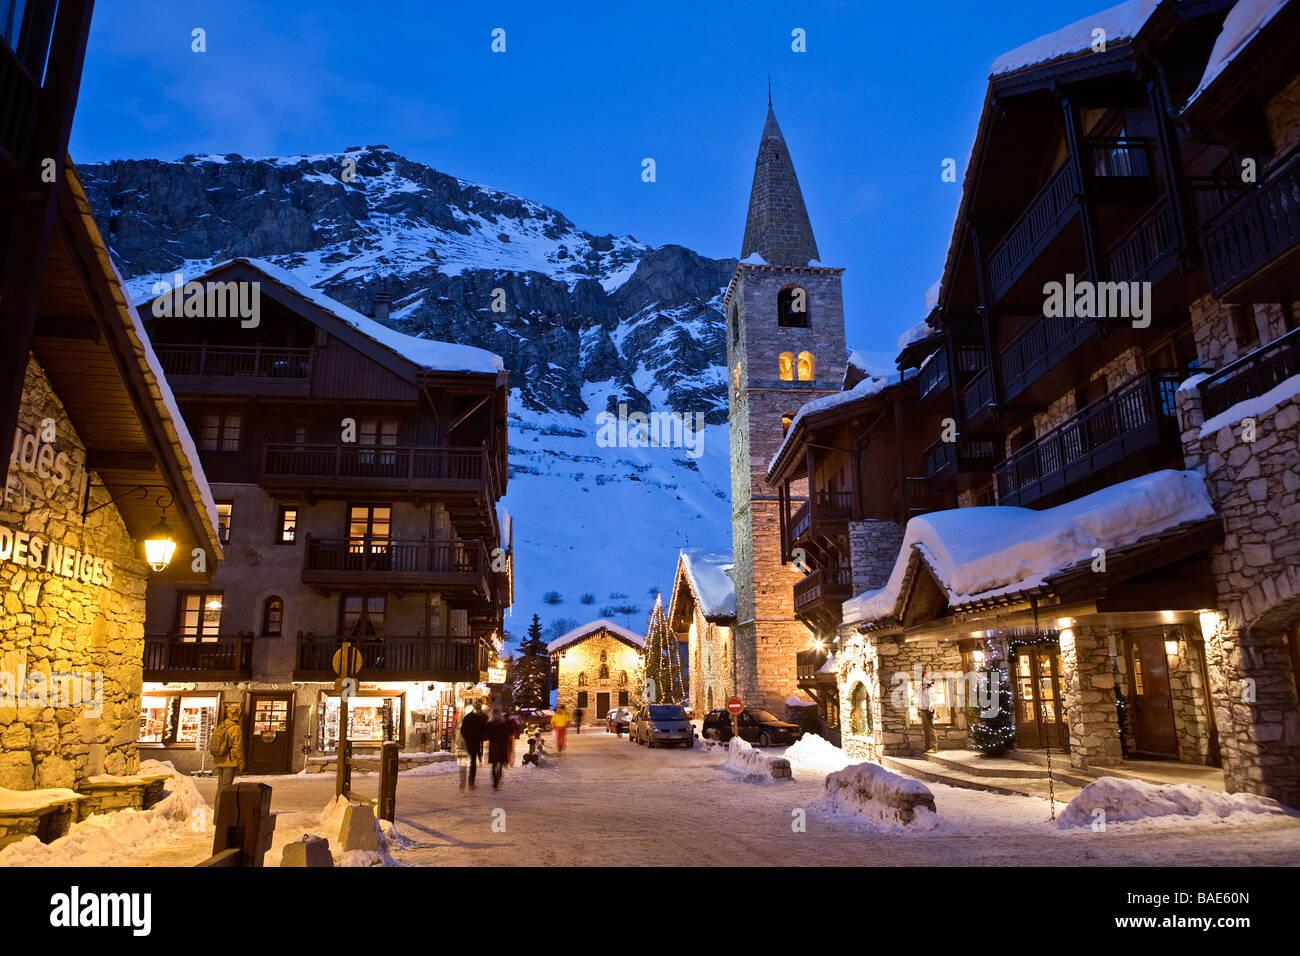 France, Savoie, Val d'Isere, view of the village and Saint Bernard de Stock Photo - Alamy